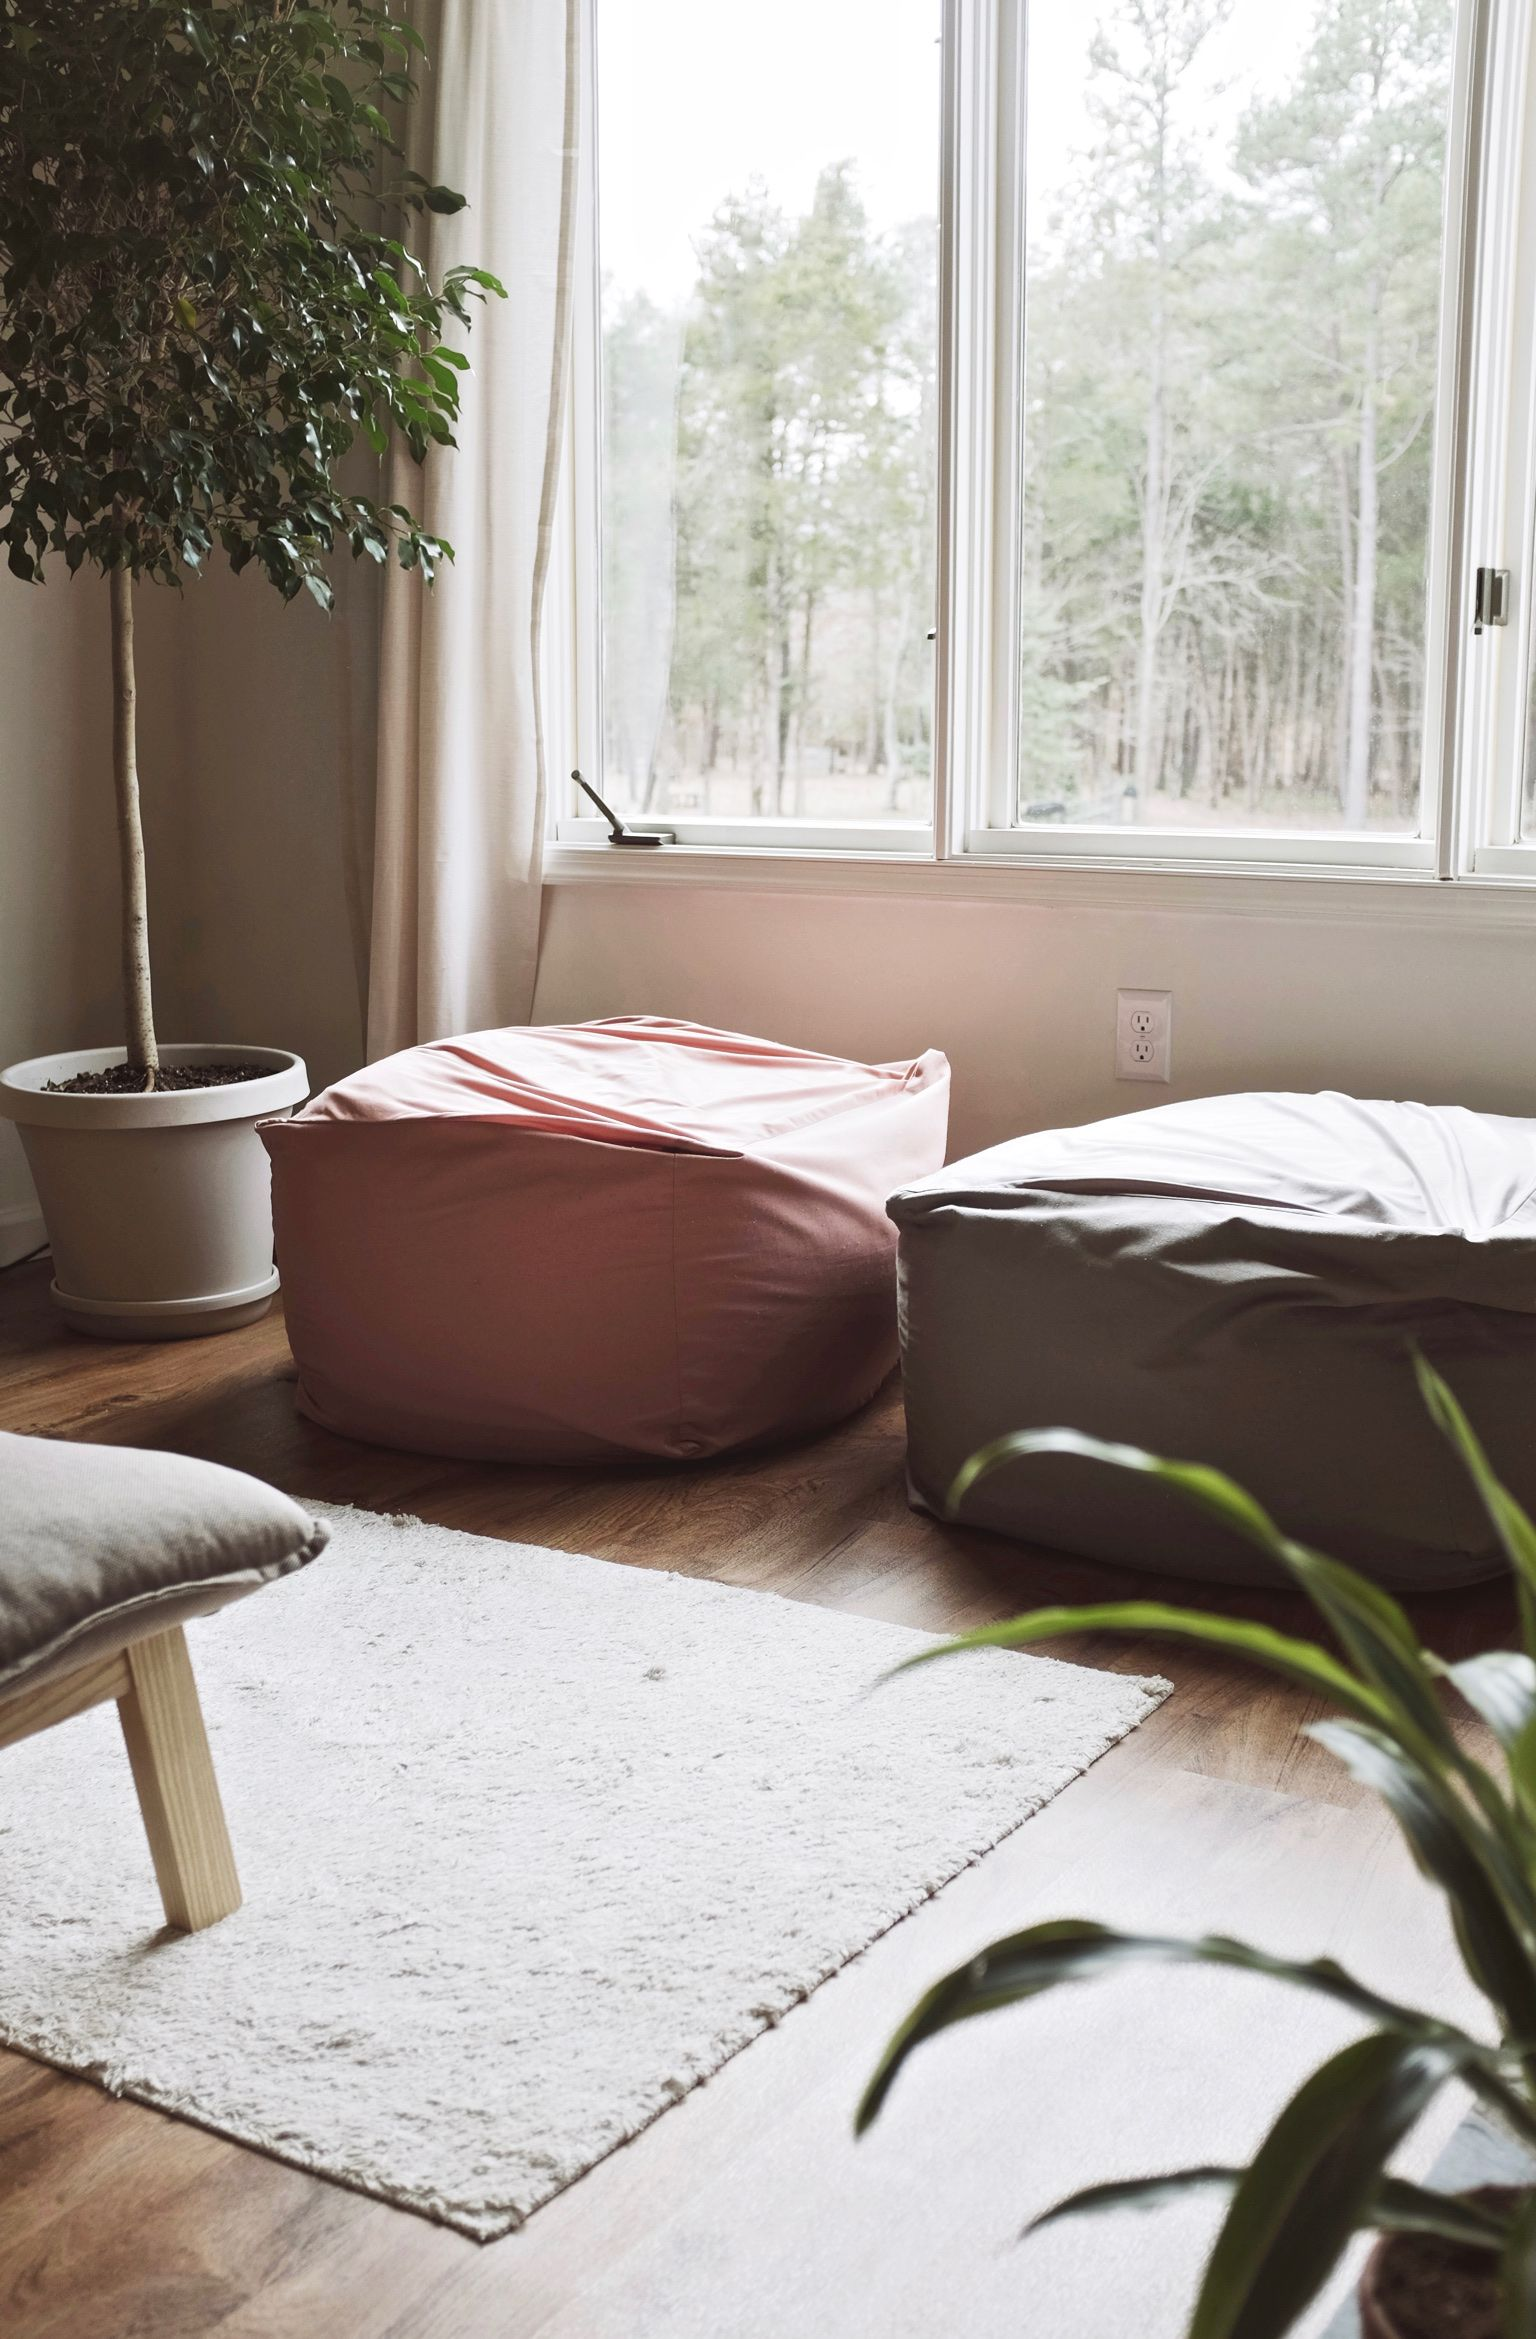 Everyone deserves a Muji body fit cushion Muji markets these as